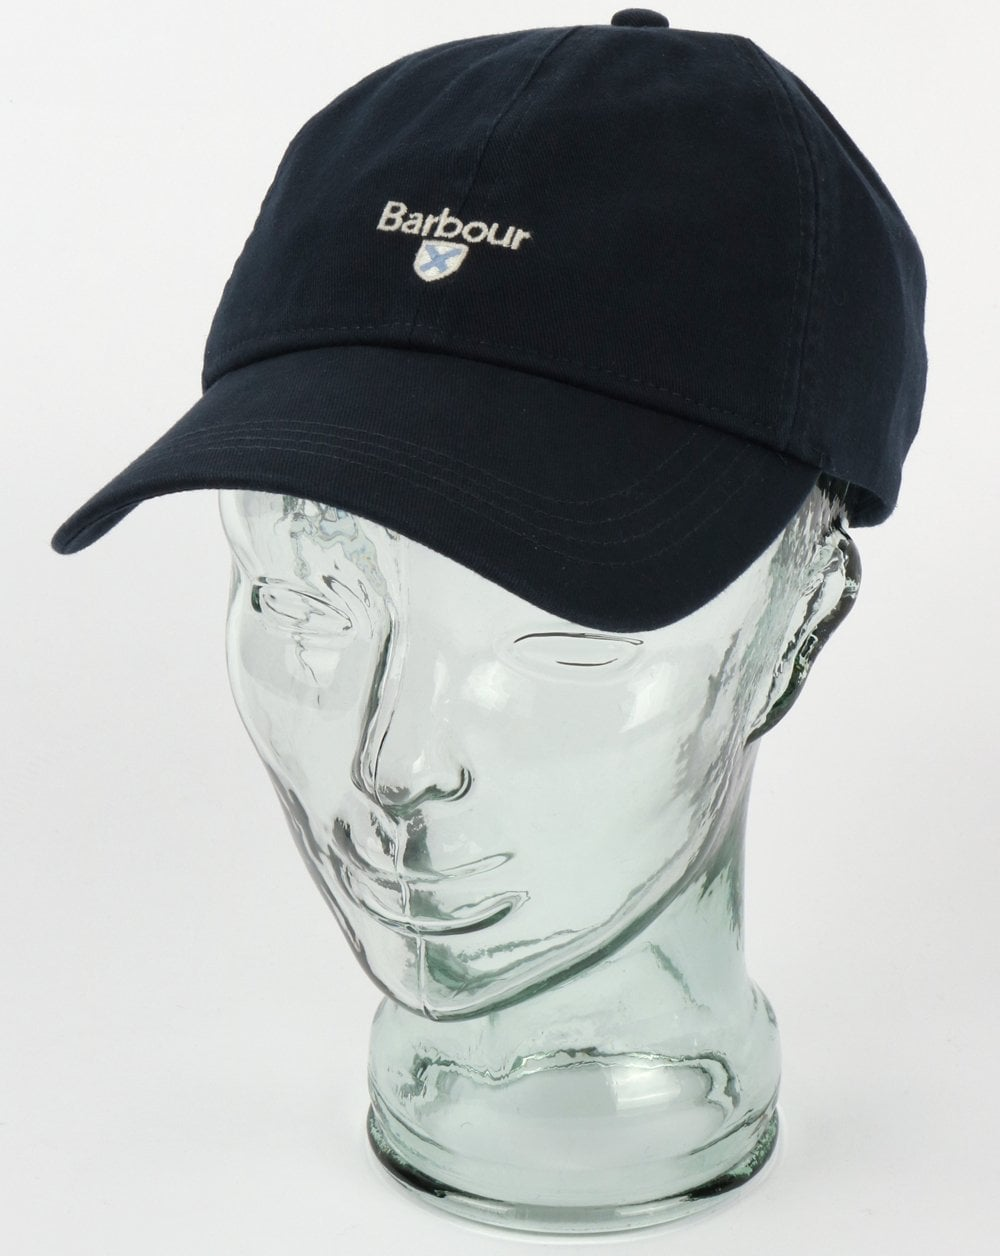 Barbour Cascade Baseball Cap Navy 38f1115c0528